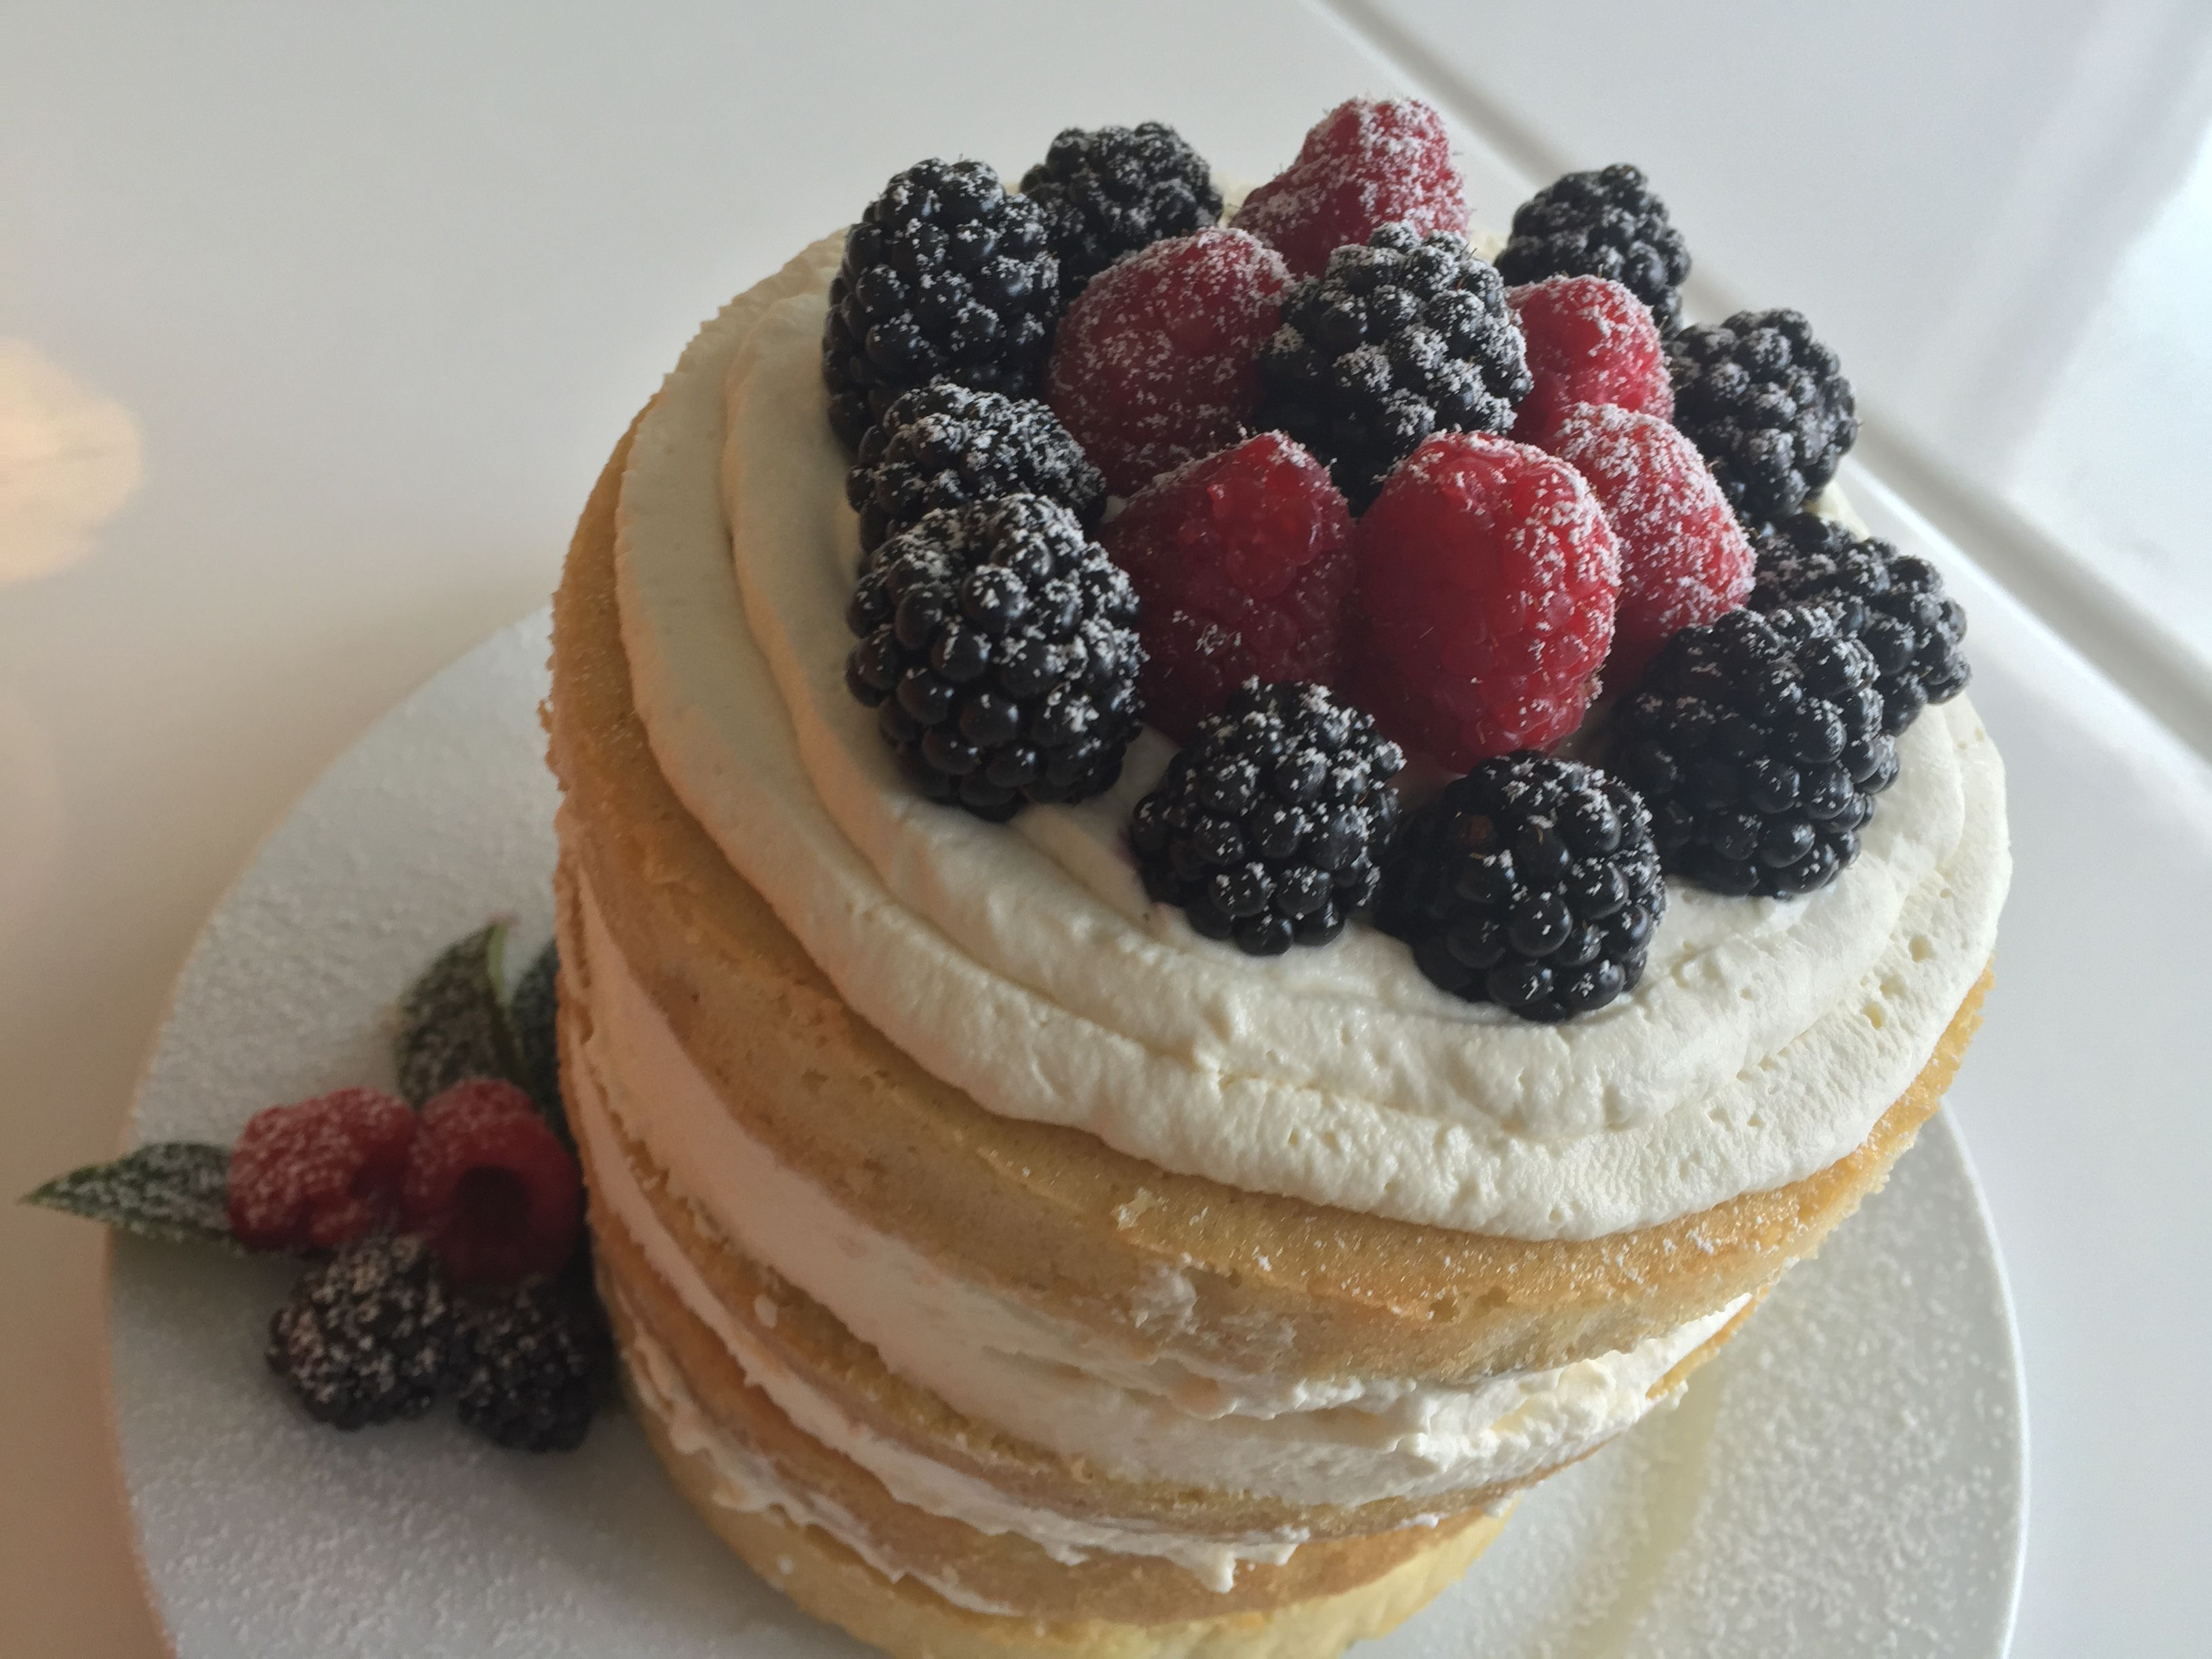 Naked Vanilla Cake with Mascarpone and Berries